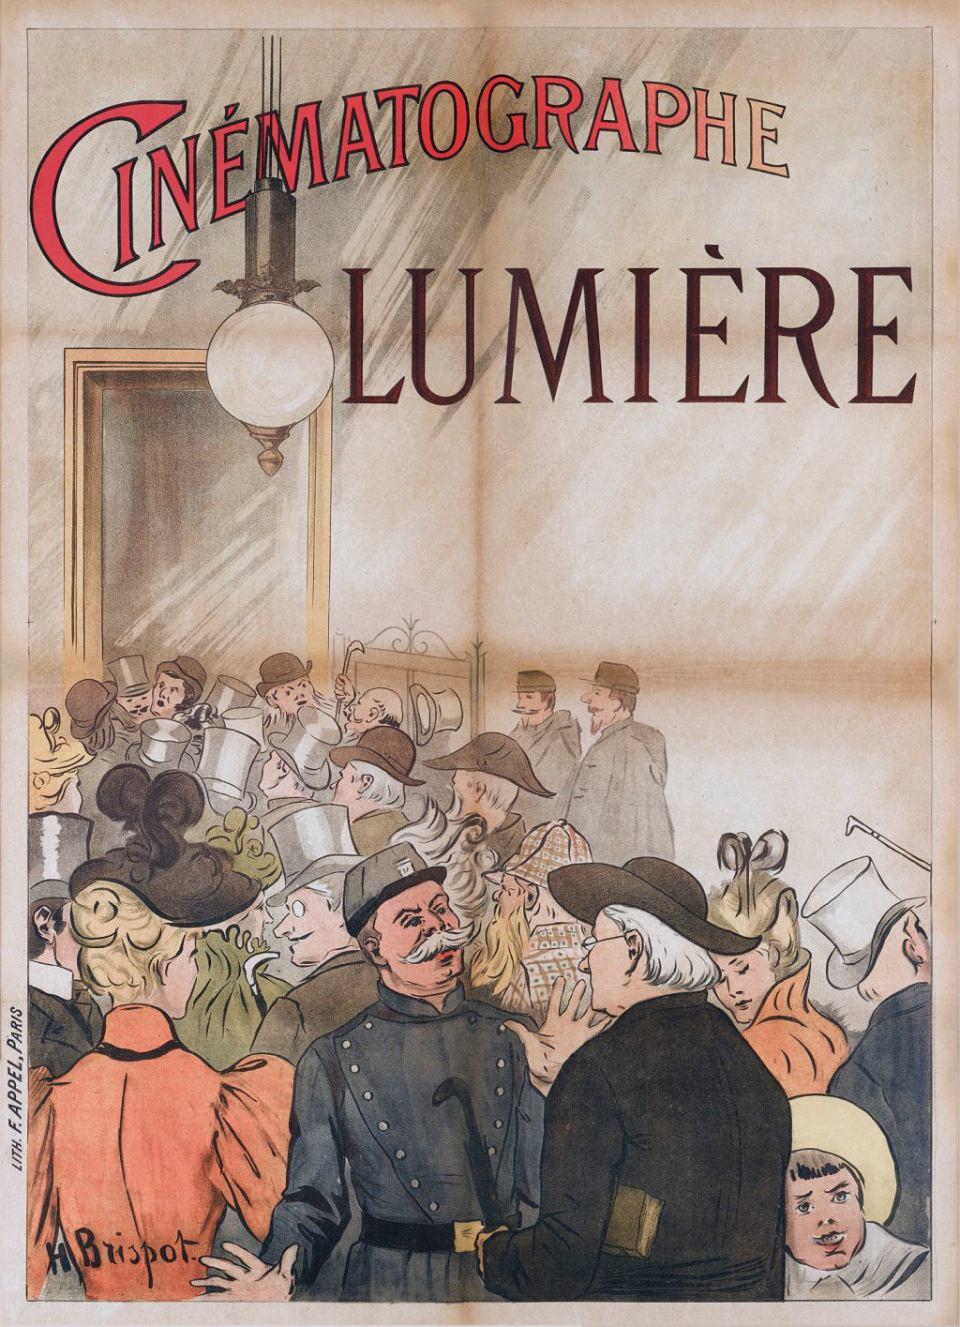 Cinematographe Lumiere 1895.